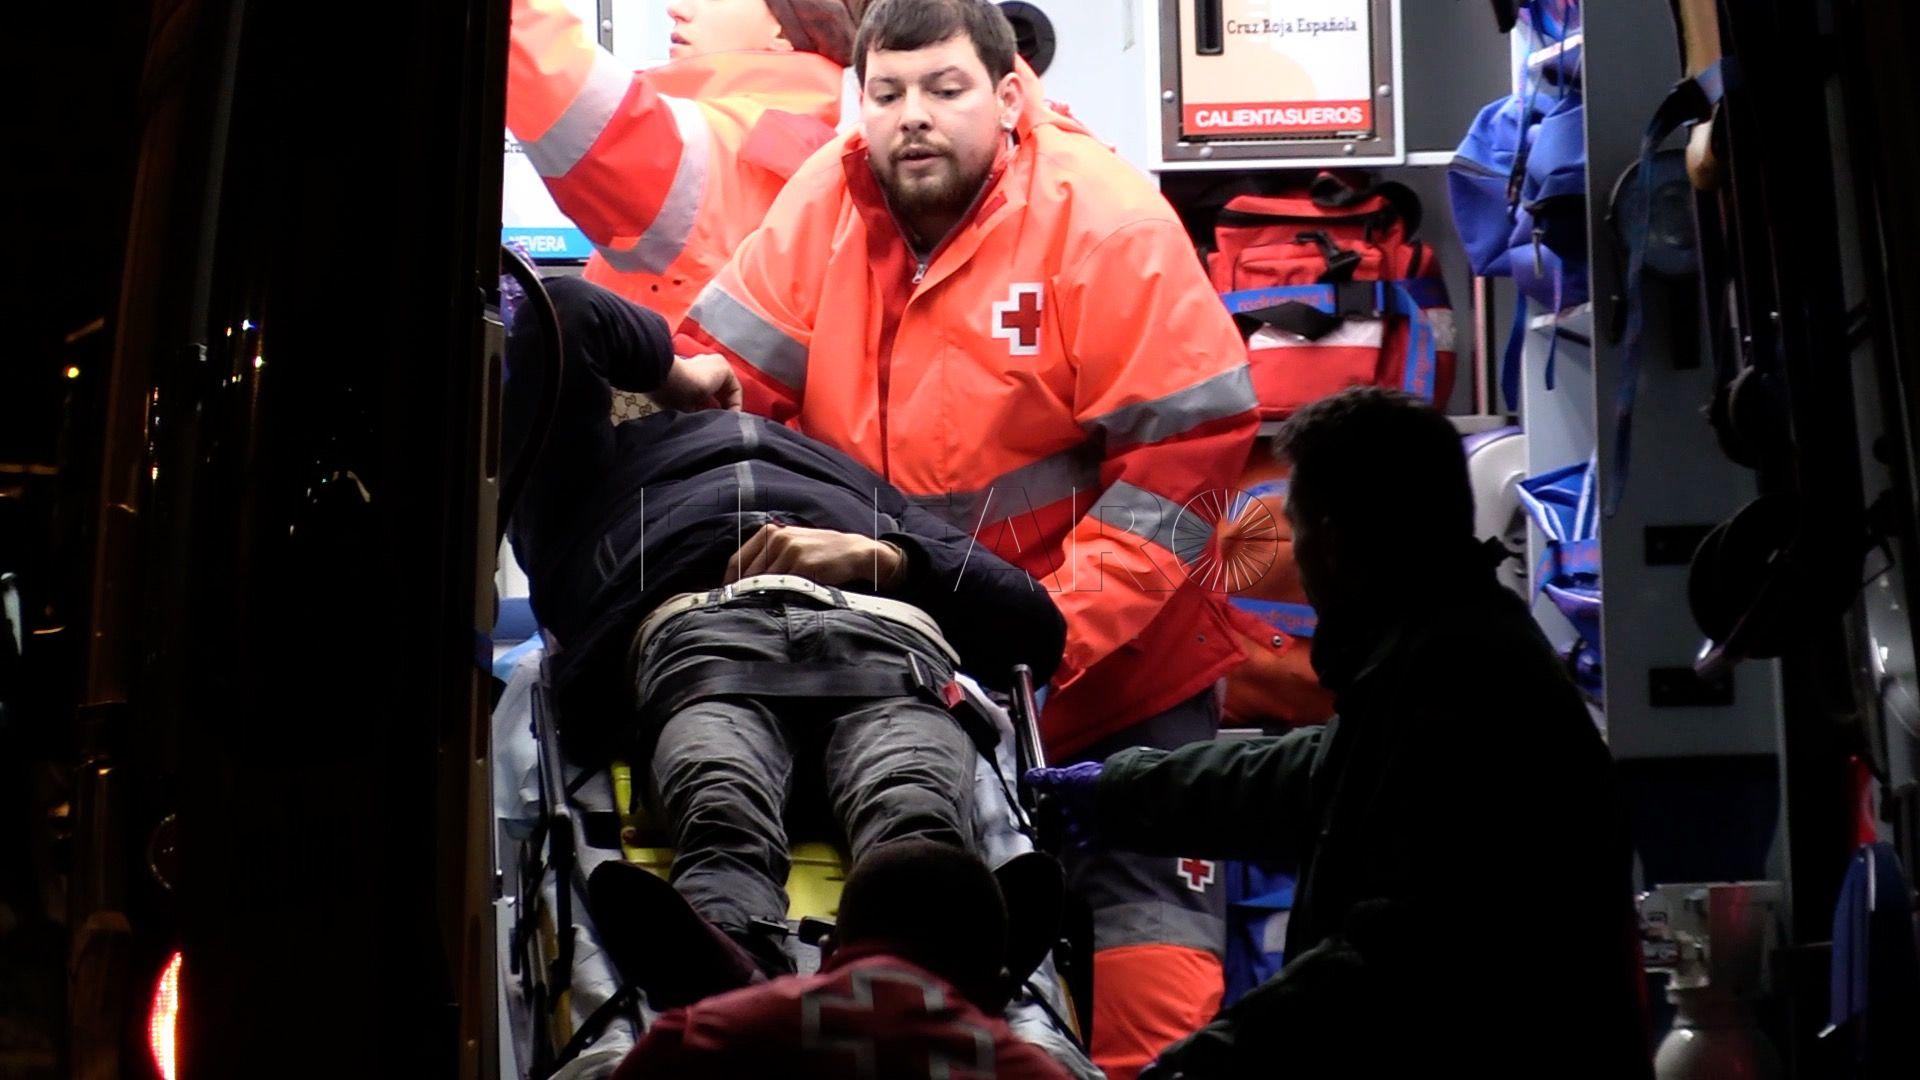 Inmigrante-rescatado-guardia-civil- Ambulancia